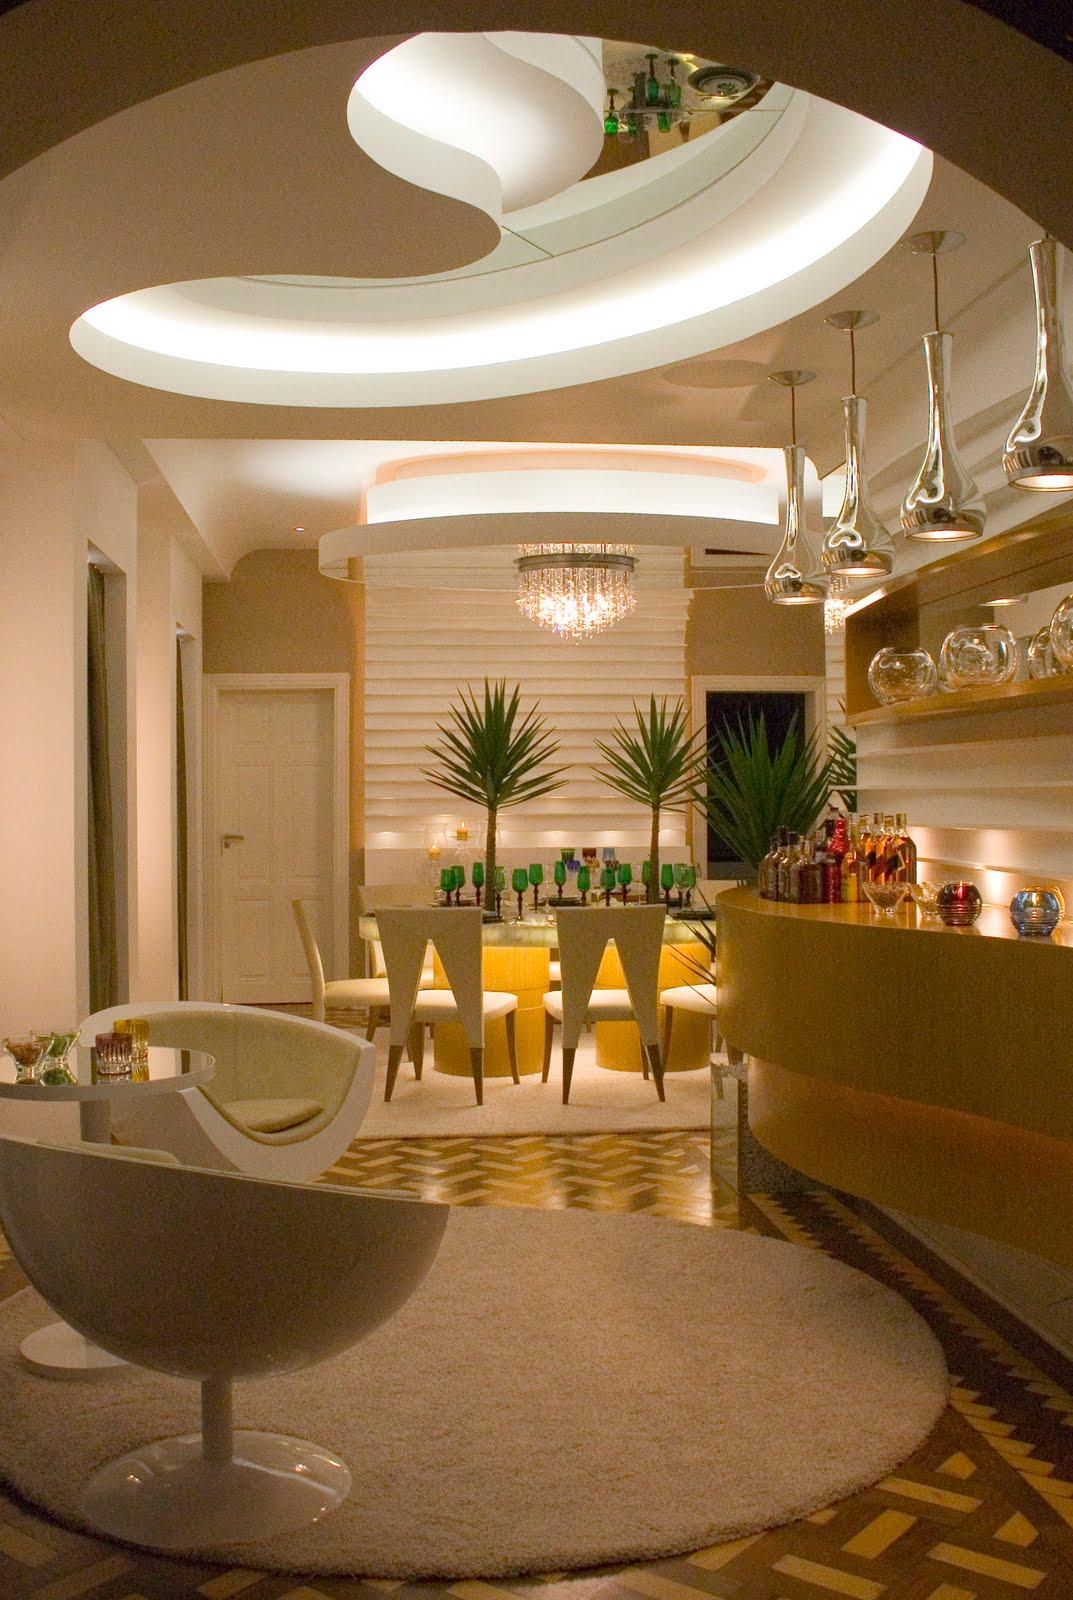 Sala De Jantar Iara Kilaris ~ Programa Por Aí  Arquiteto personaliza ambiente na Campinas Decor